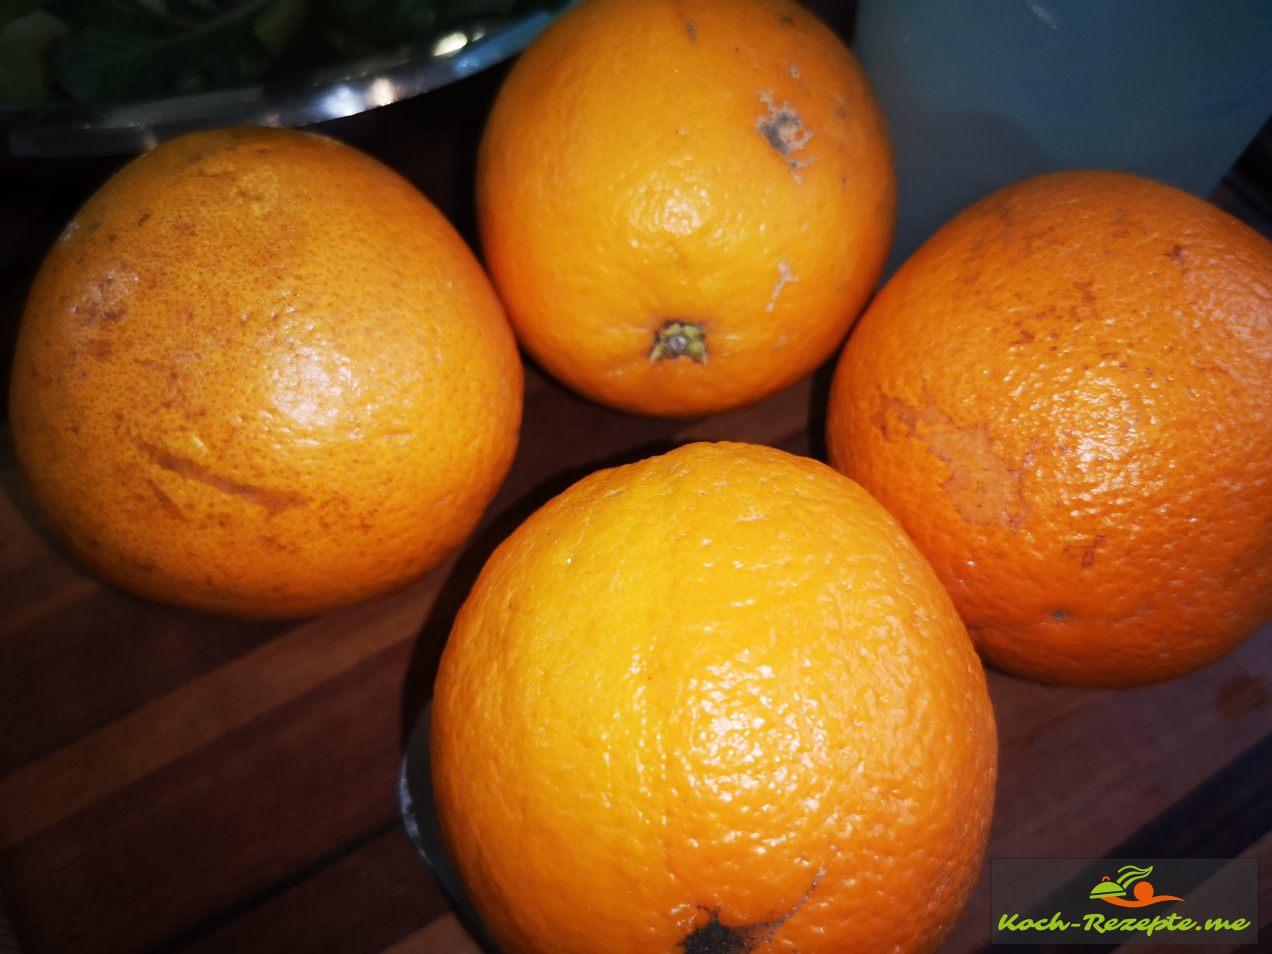 Apfelsinen Saft